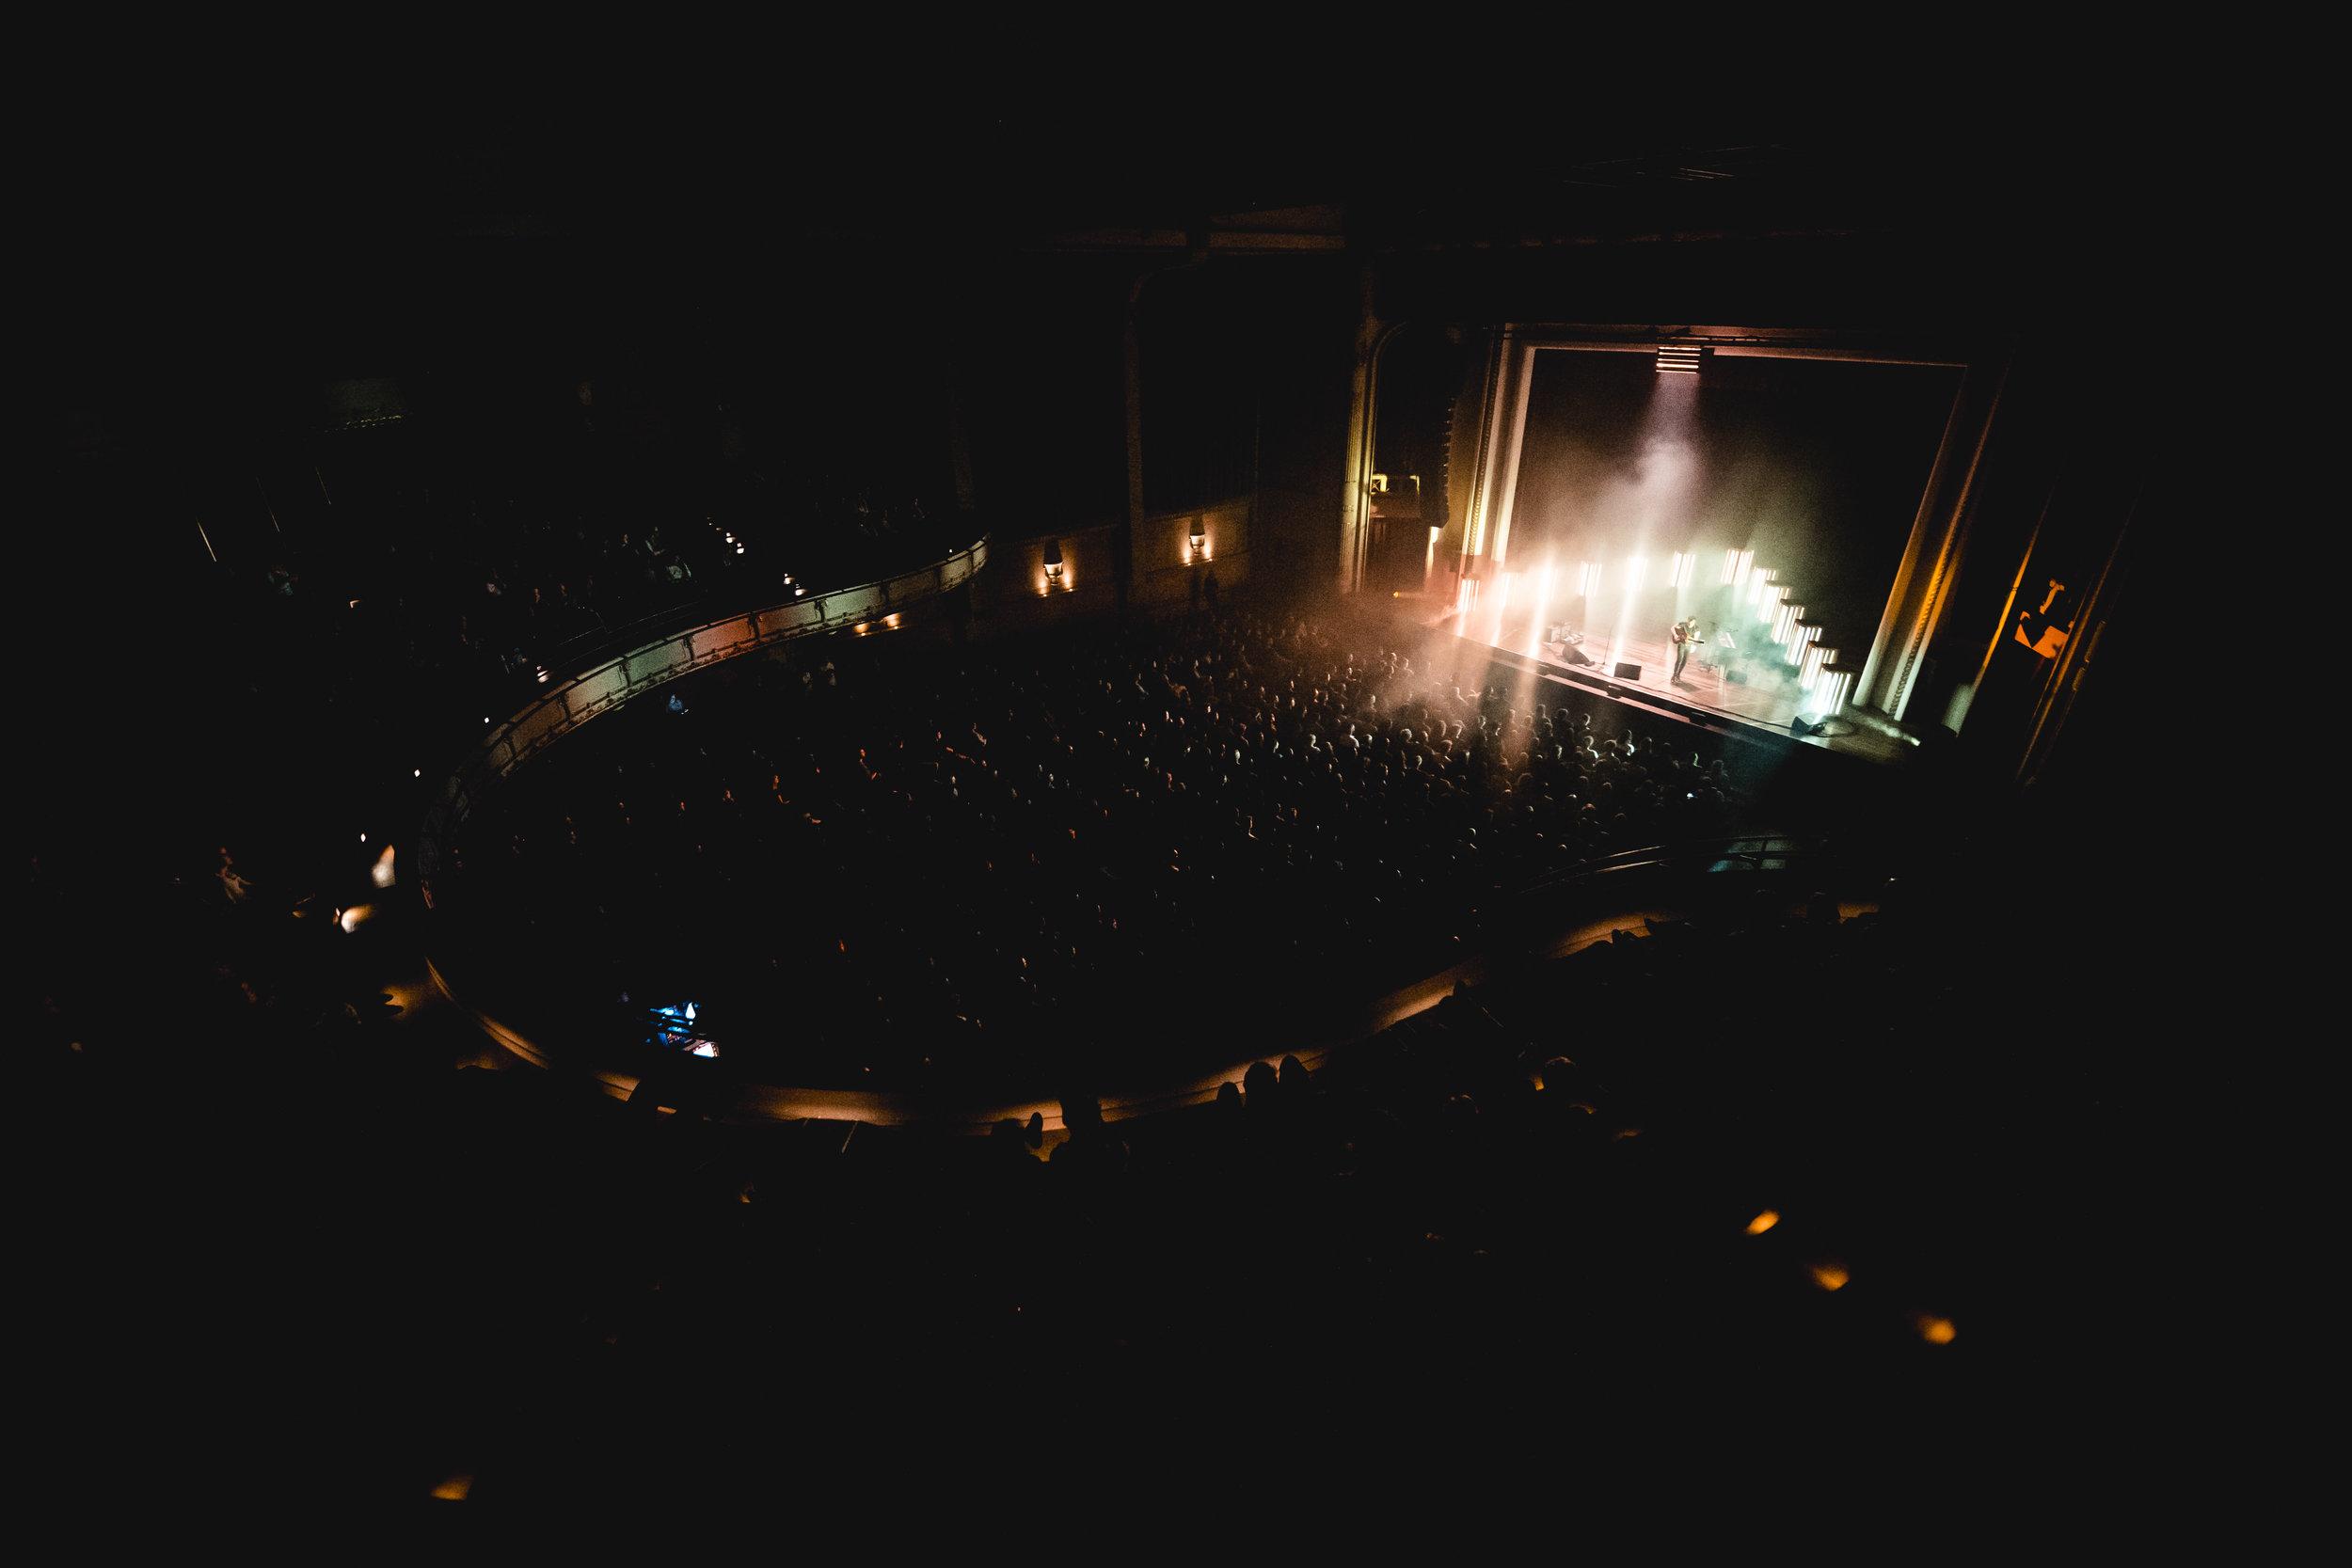 2018-09-27 - De Roma - The Tallest Man on Earth - 02 concert - 015.jpg